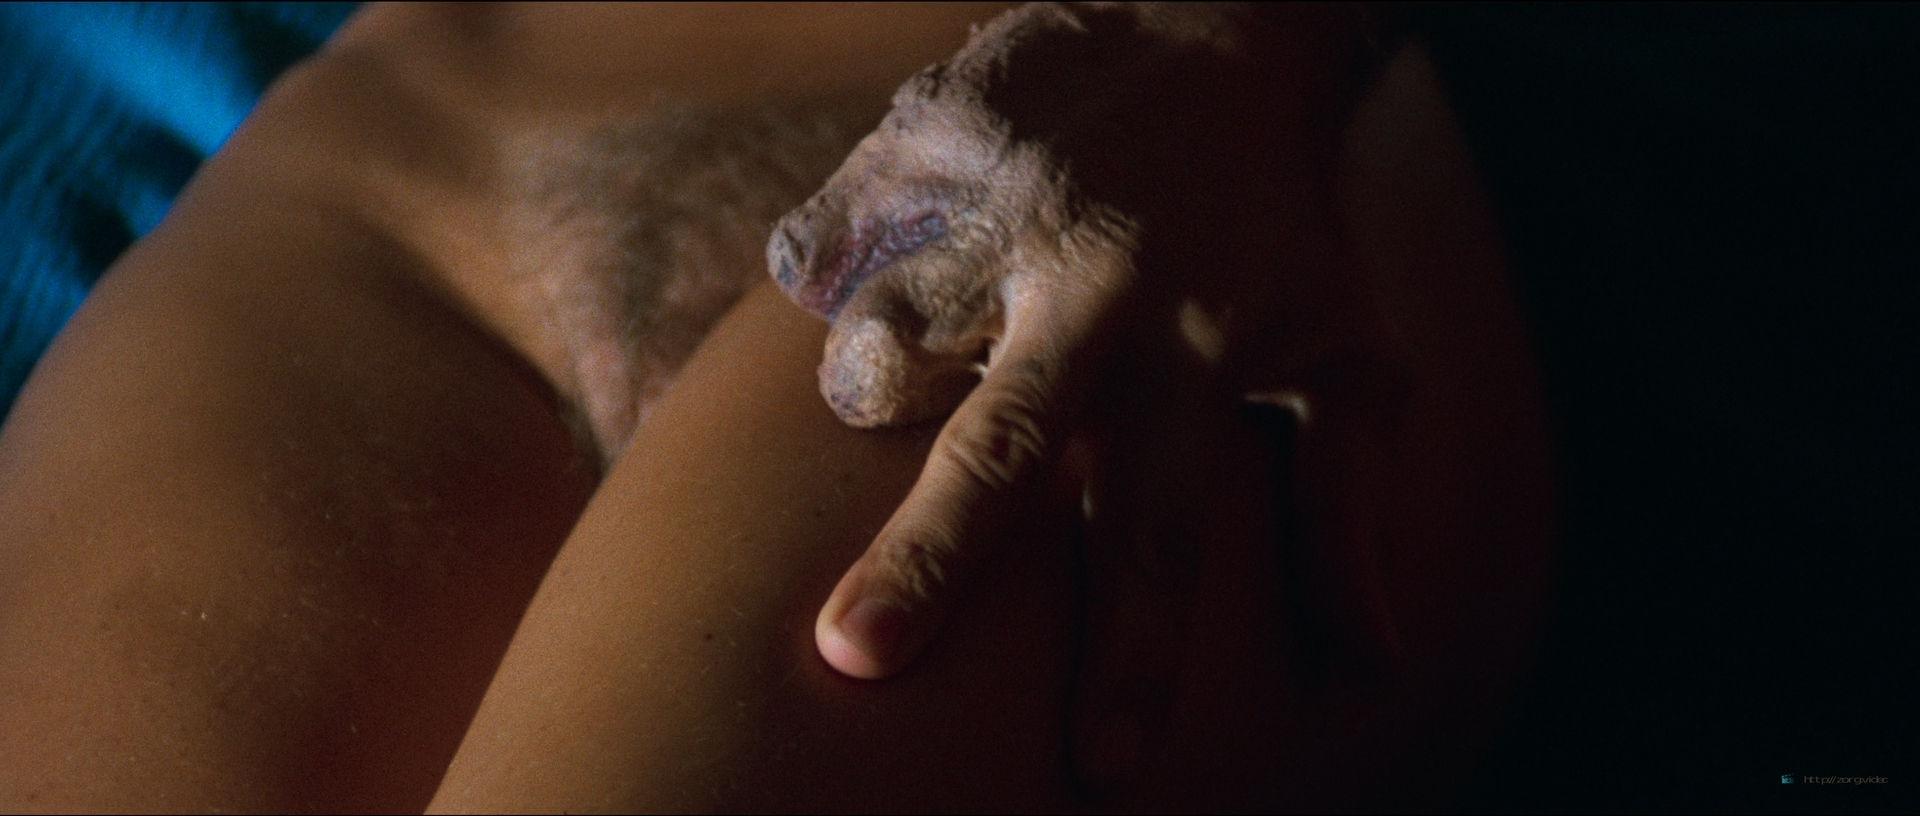 Daniela Doria nude full frontal Zora Kerova and other nude - The New York Ripper (IT-1982) HD 1080p BluRay(r) (5)